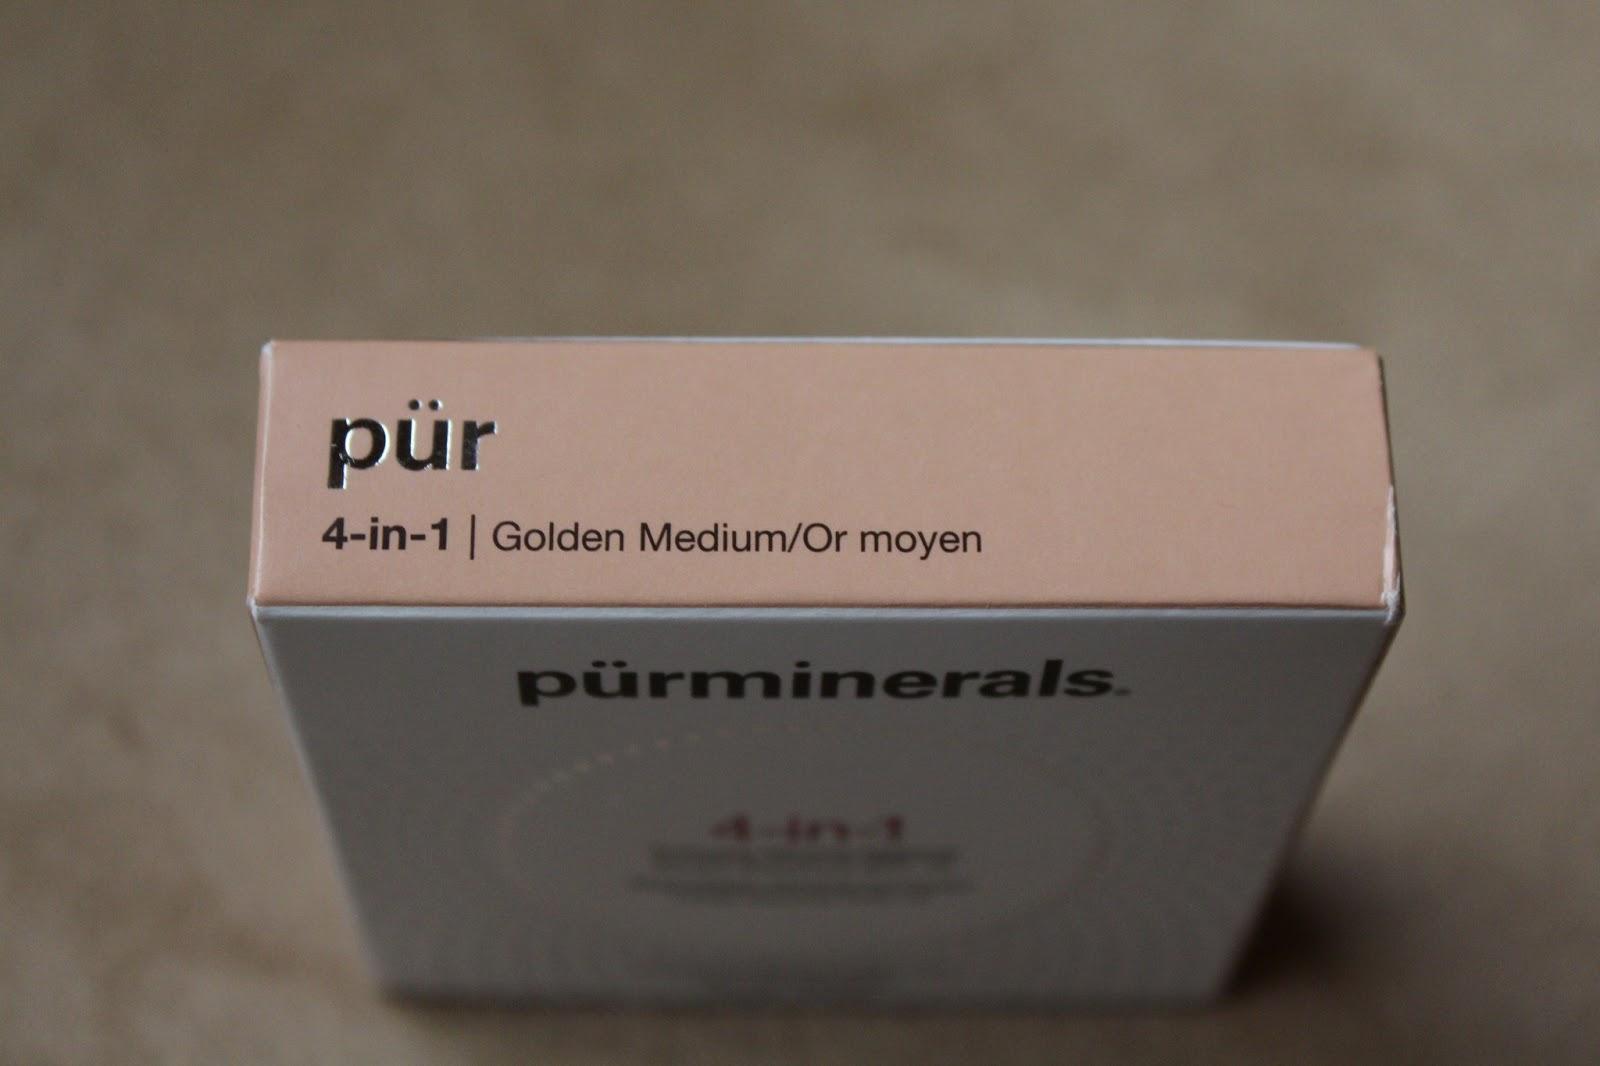 4-in-1 Pressed Mineral Powder Foundation SPF 15 by pür #10